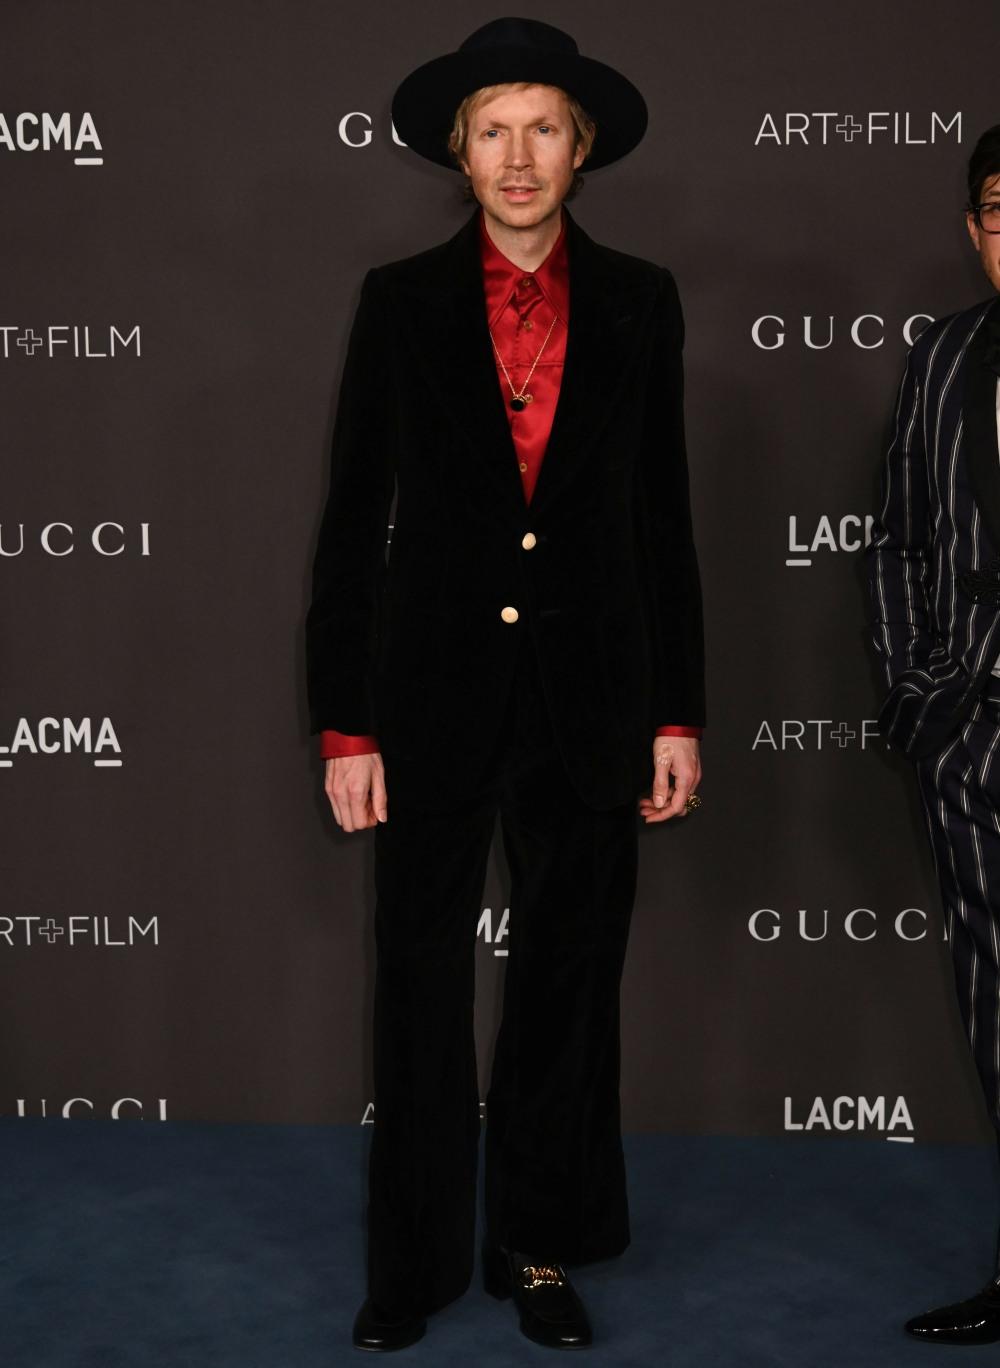 Beck attends the 2019 LACMA Art + Film Gala at LACMA on November 02, 2019 in Los Angeles, California © J Graylock/jpistudios.com